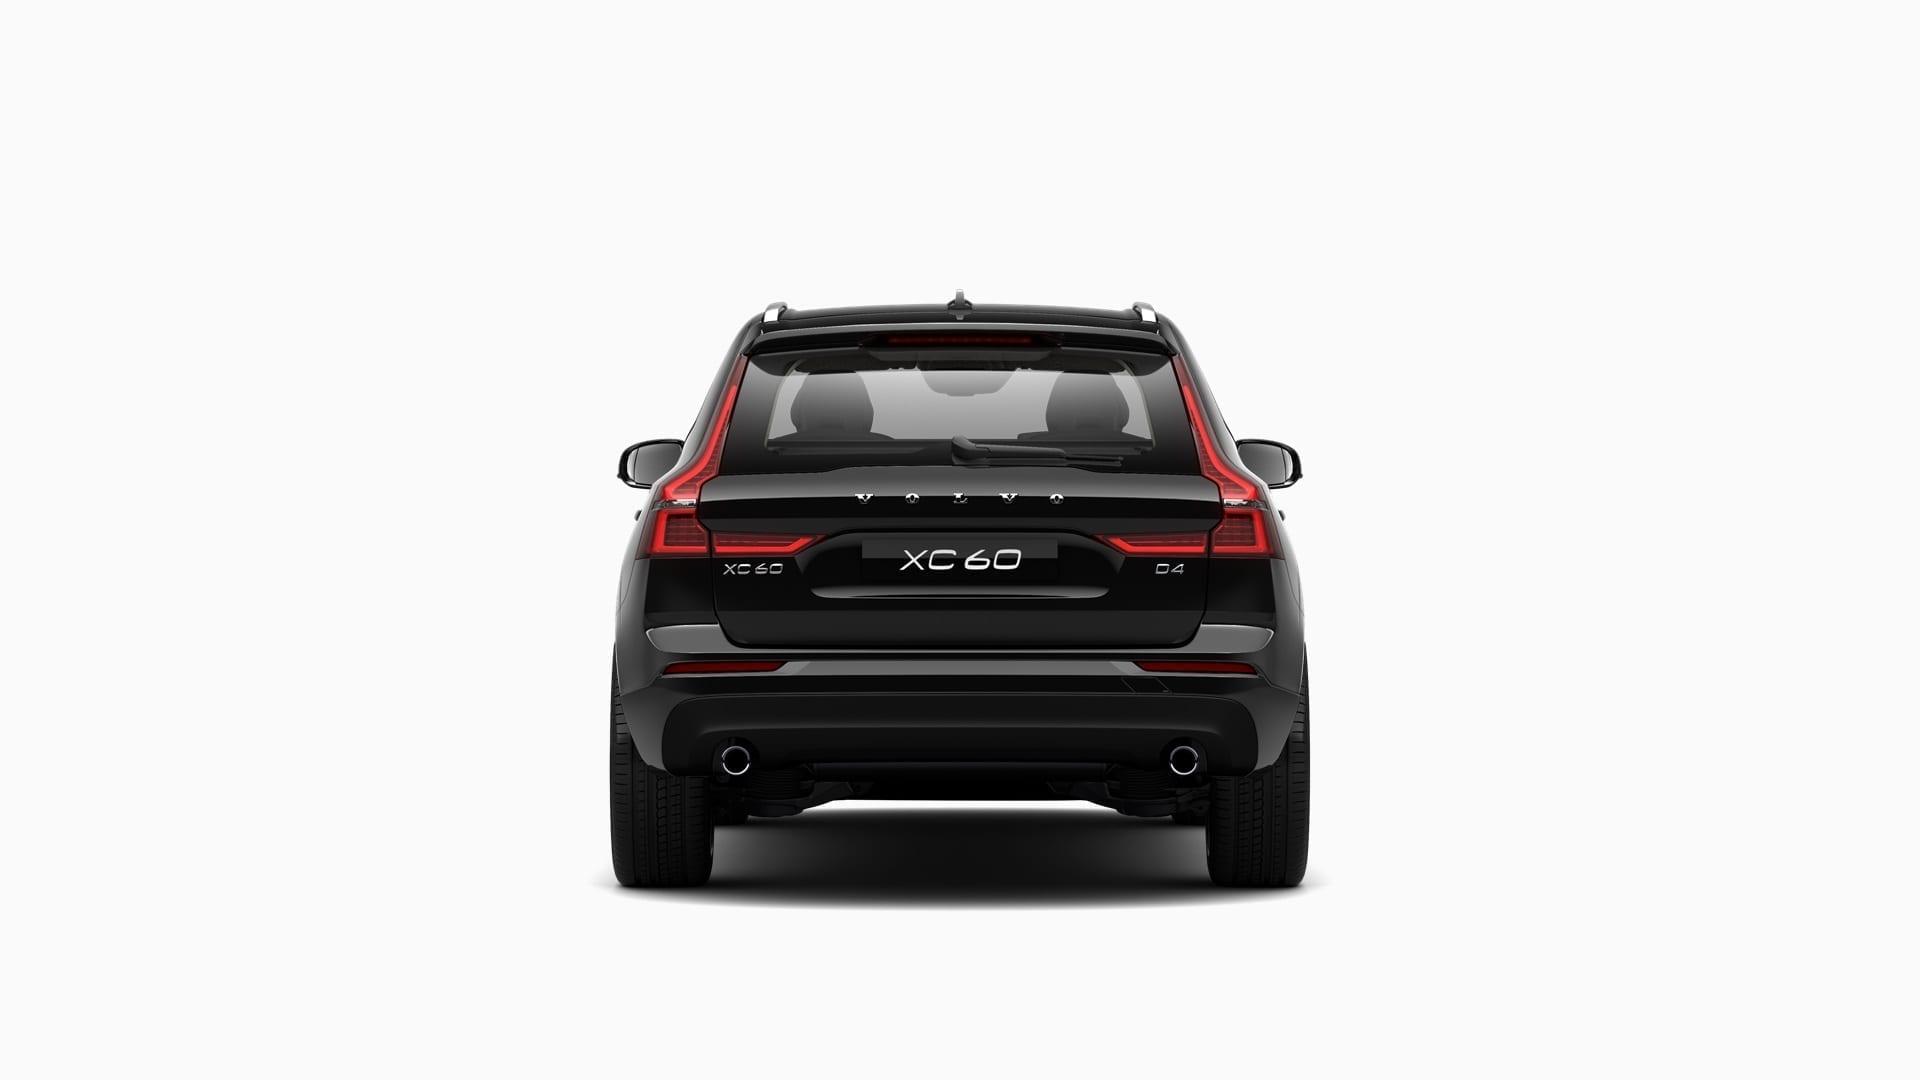 VOLVO XC60 D4 Black Solid, Ice White фото 4